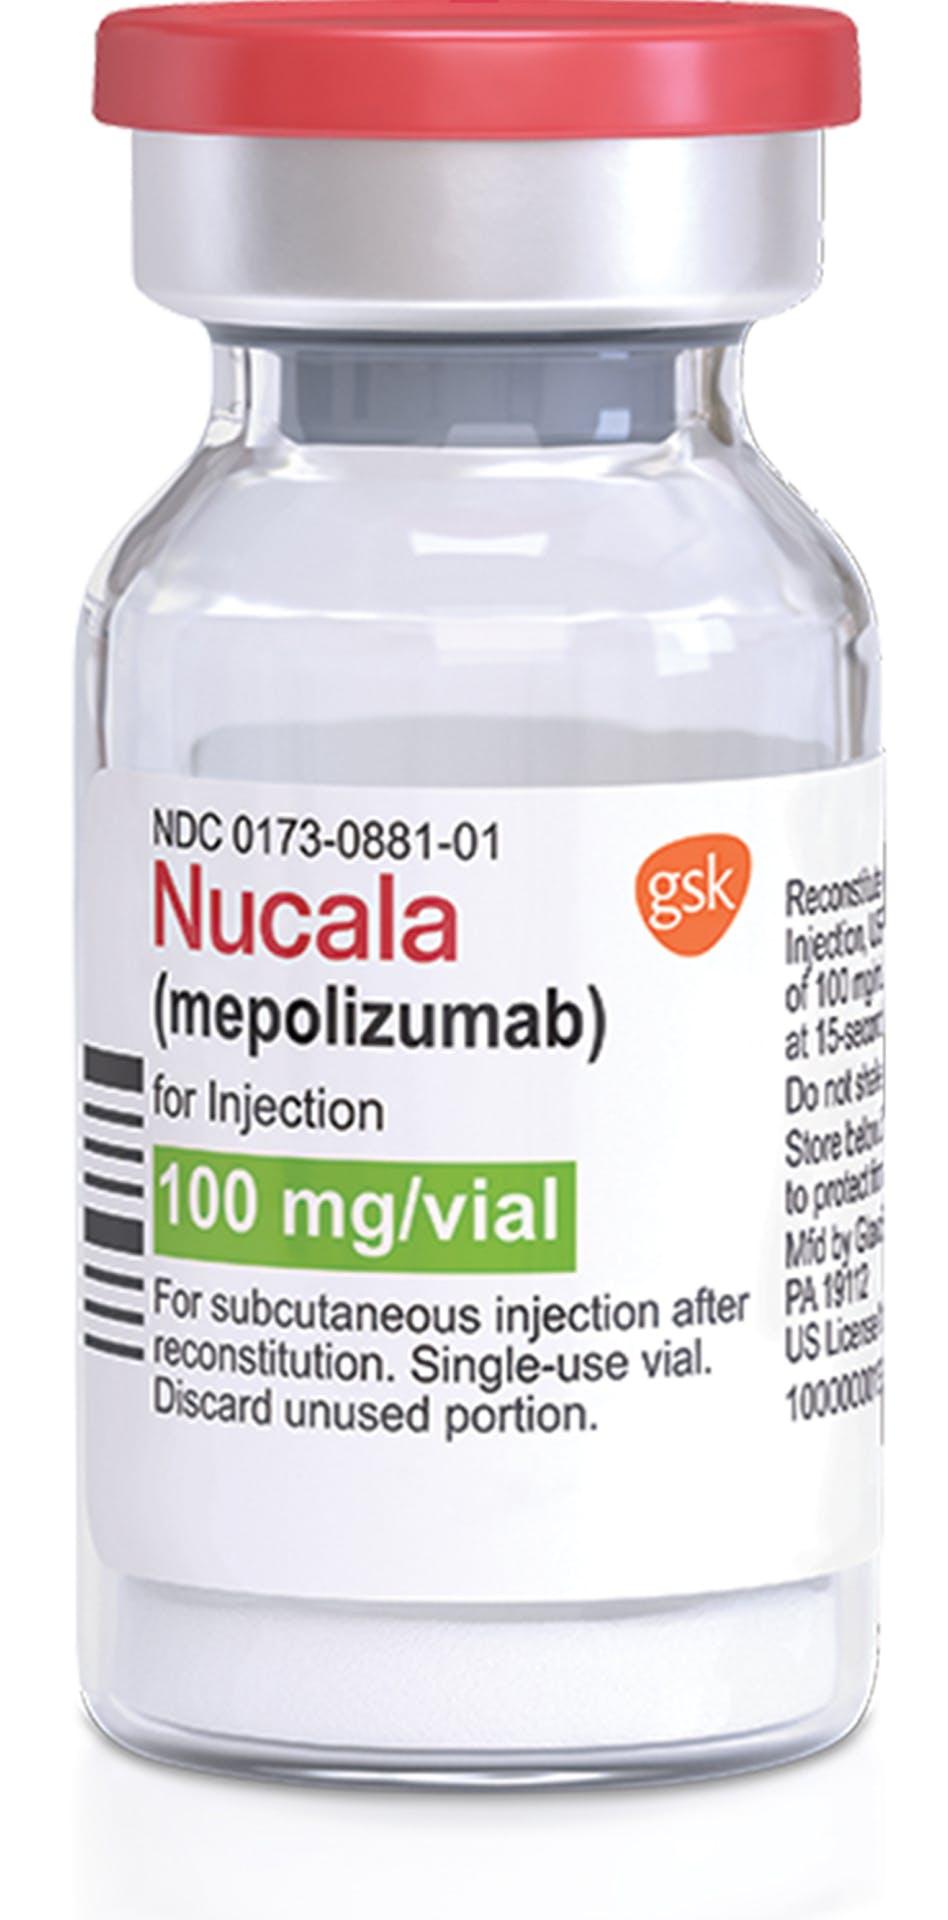 Lyophilized powder vial image